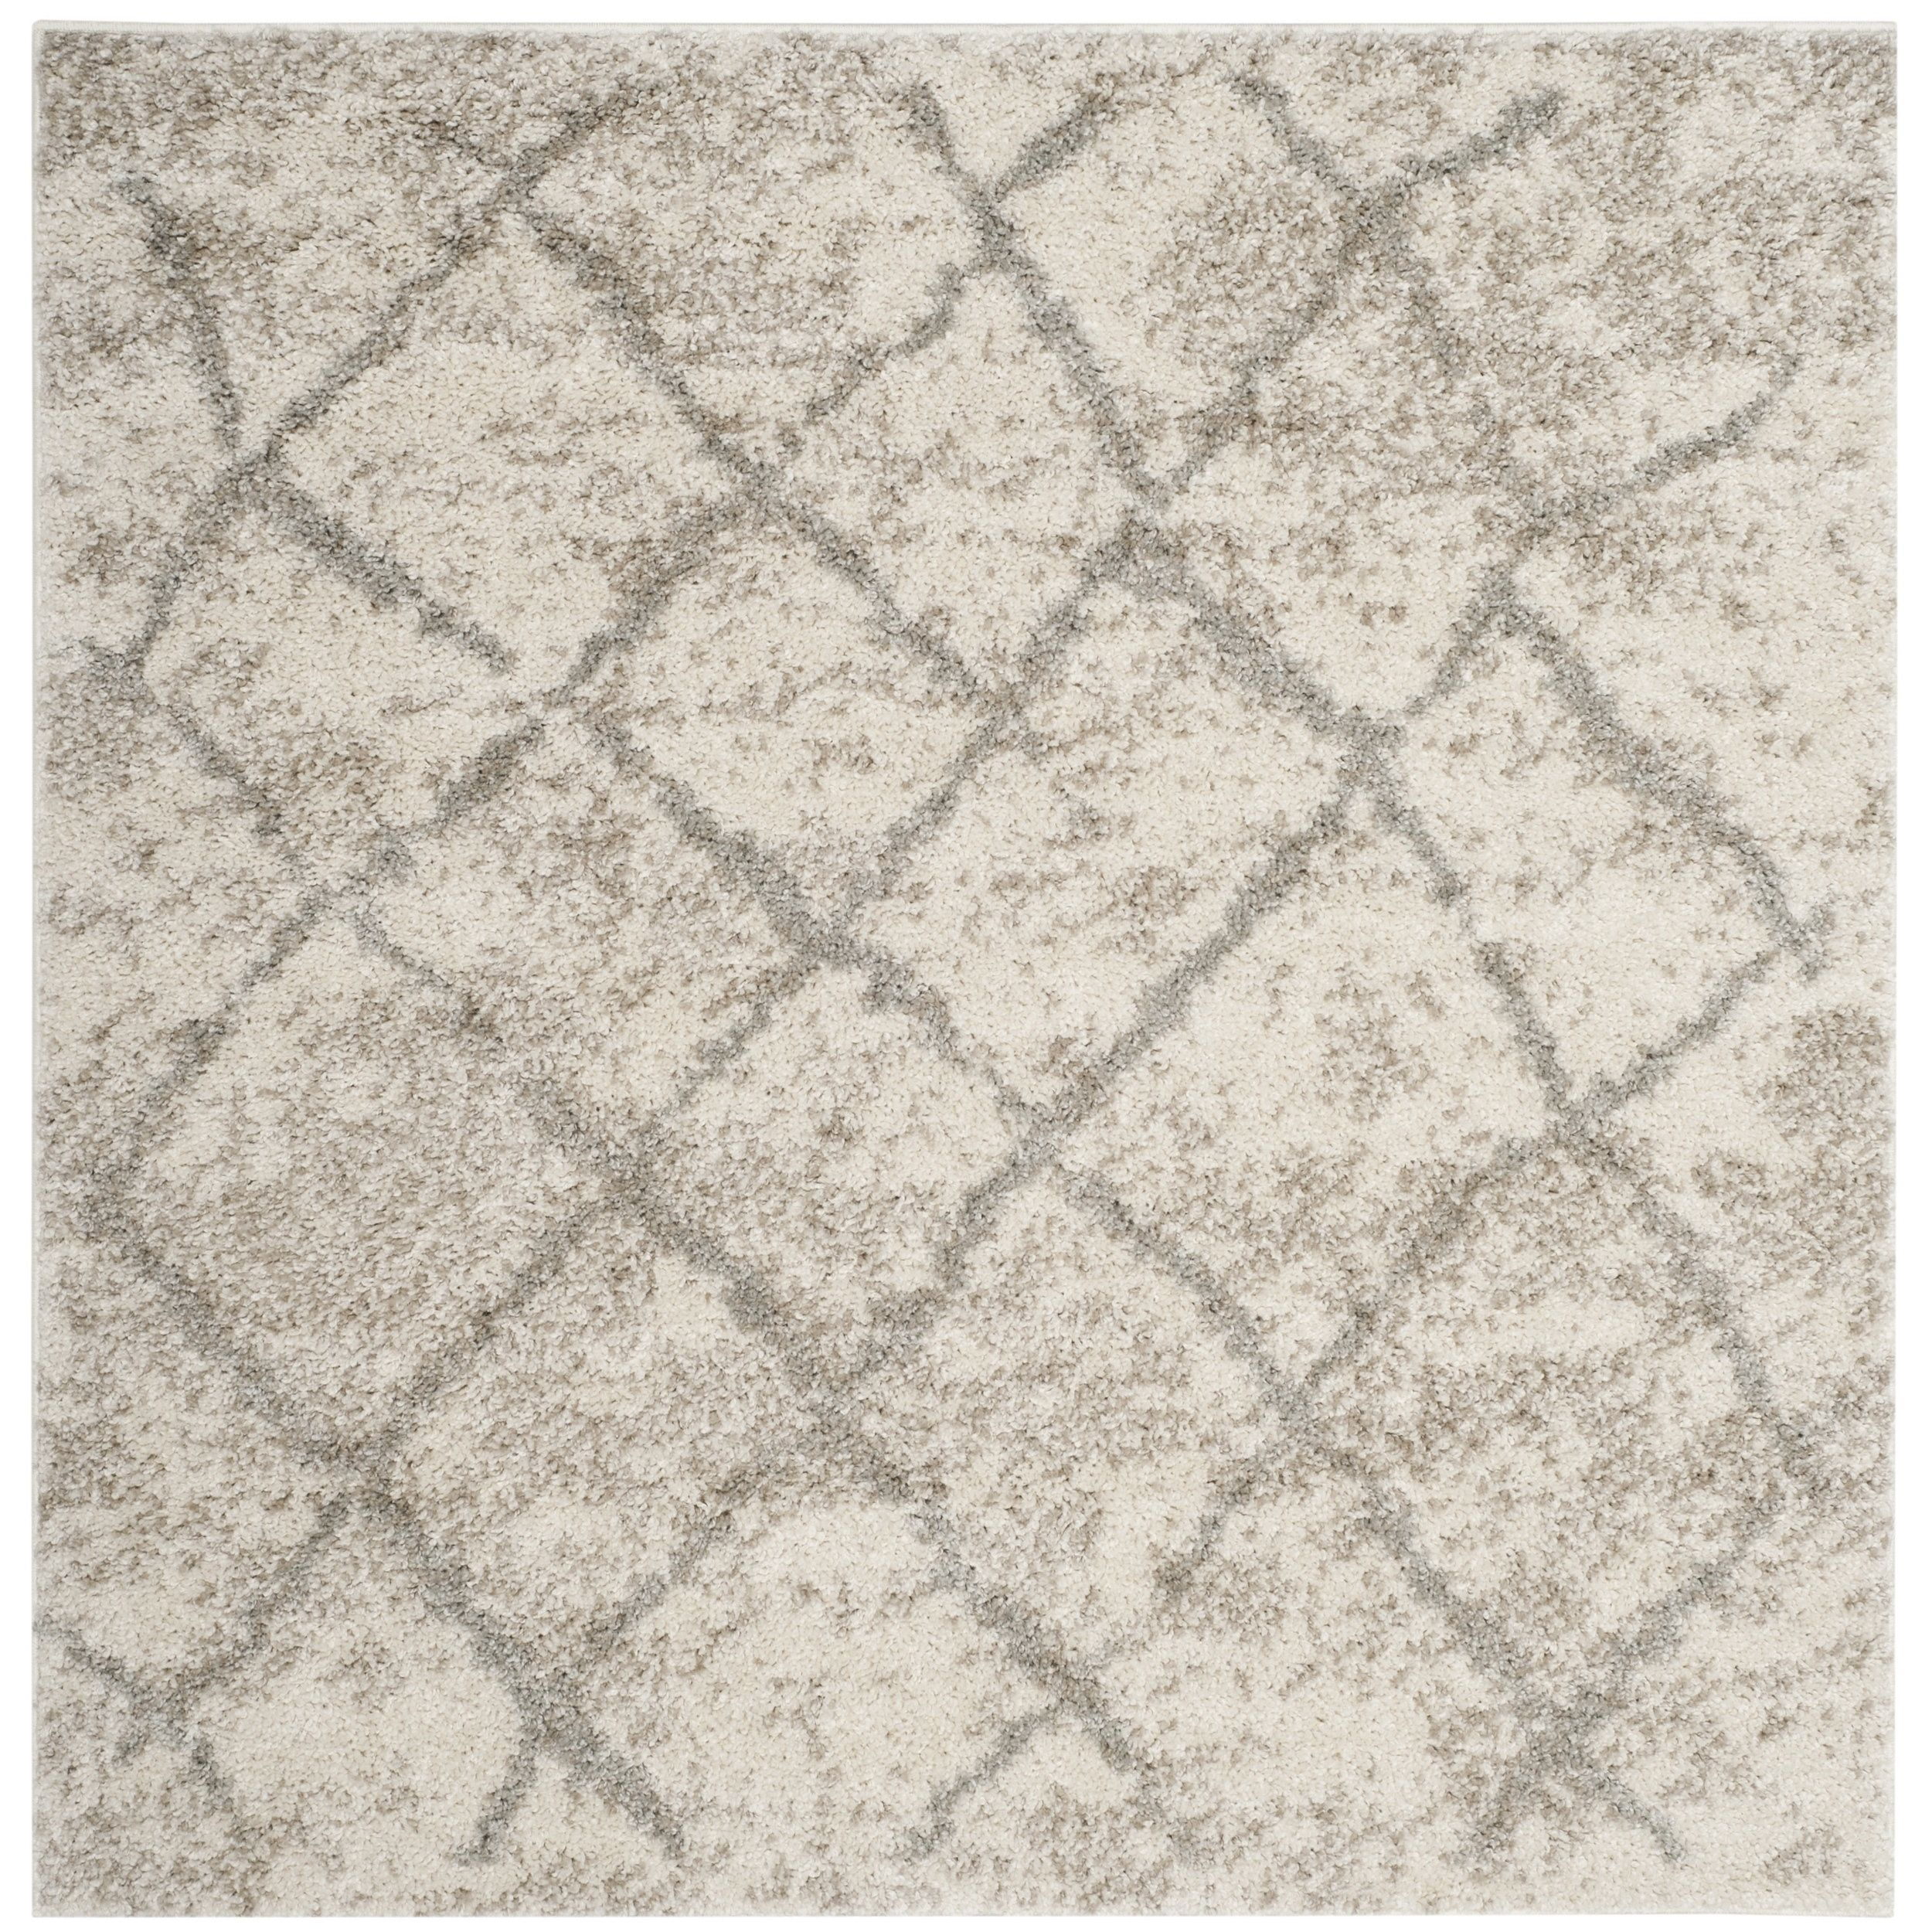 safavieh berber tribal cream ivory light grey shag rug 5u0027 1 - Grey Shag Rug